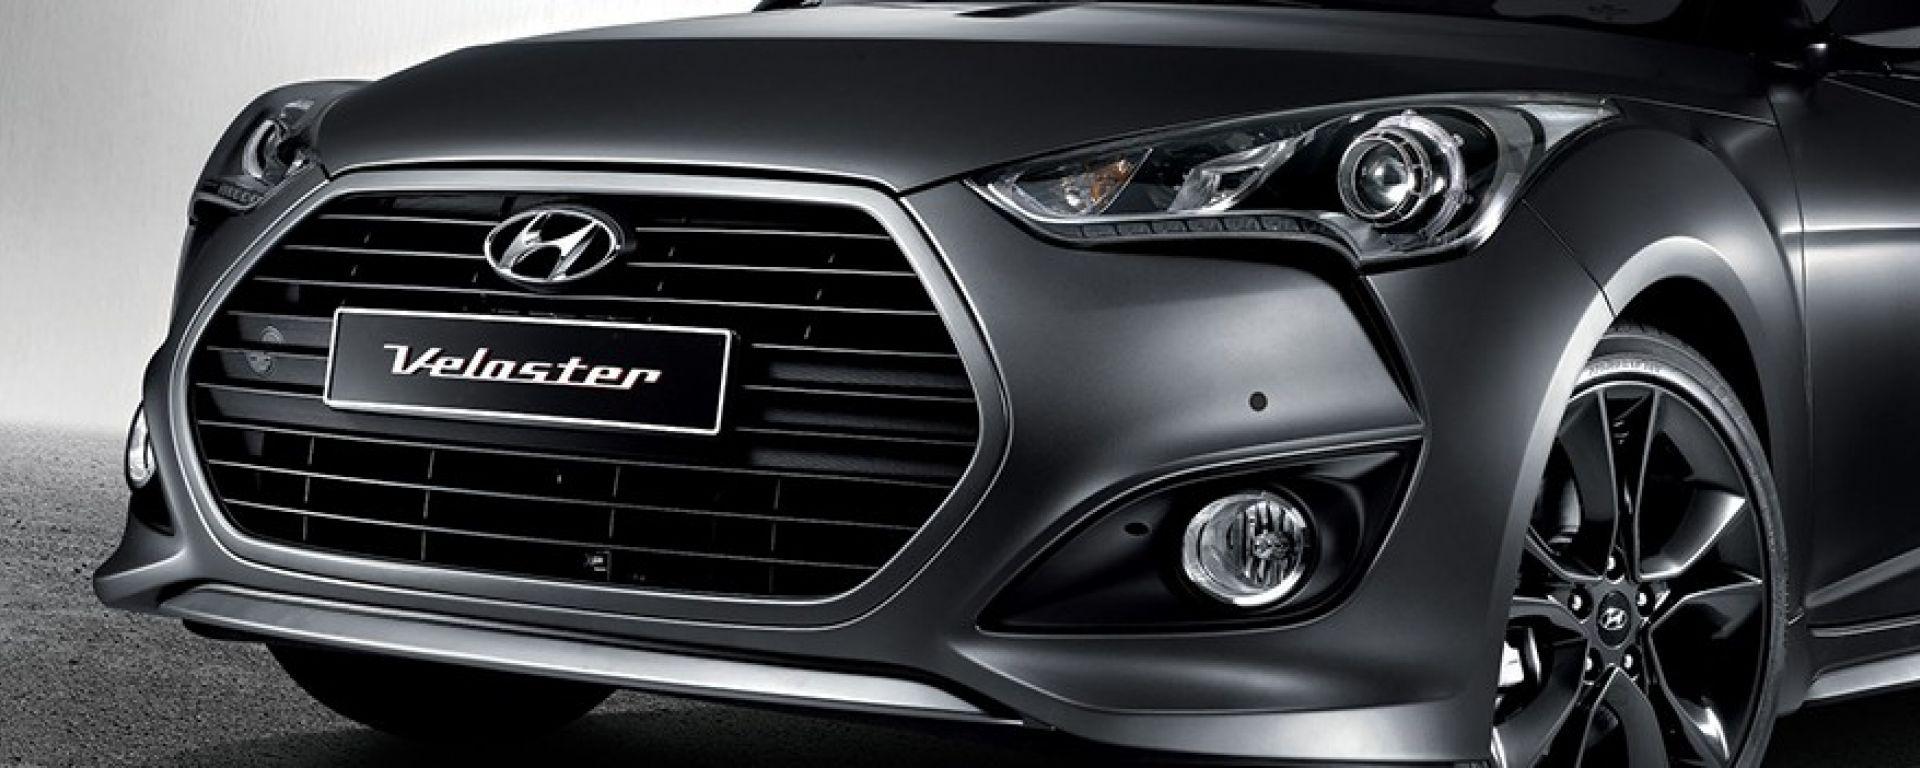 Hyundai Veloster facelift